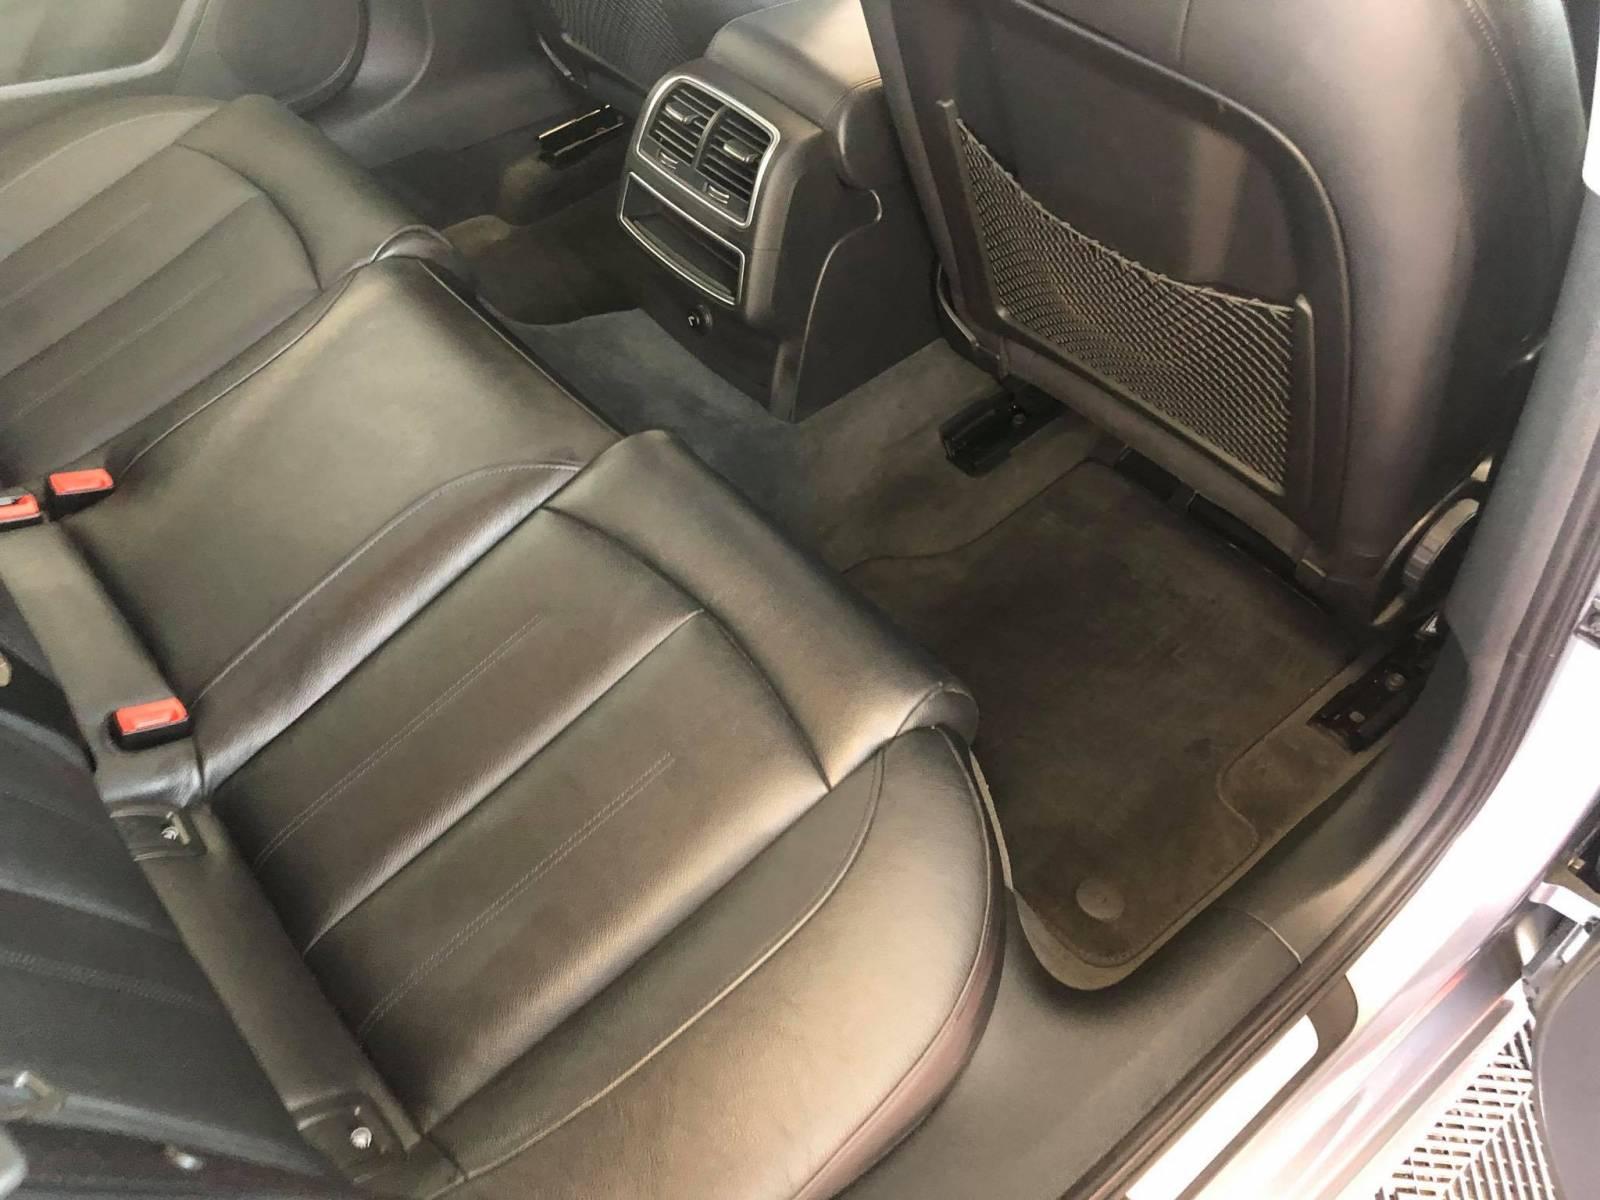 nettoyage v hicule et protection carrosserie pessac clean autos 33. Black Bedroom Furniture Sets. Home Design Ideas